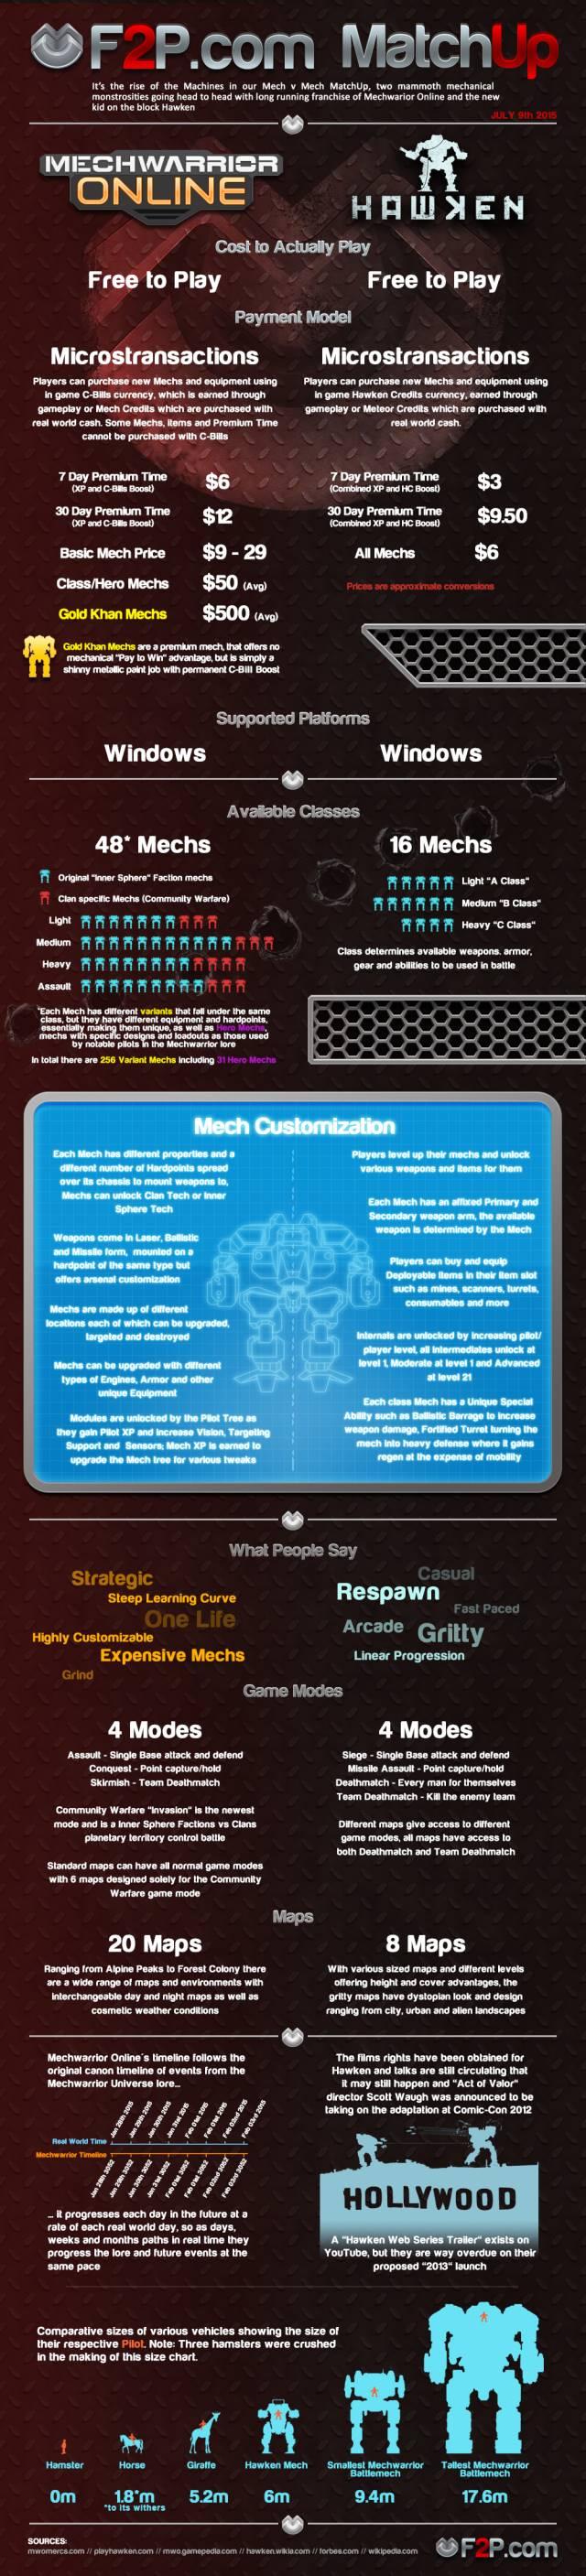 MatchUp Hawken - MechWarrior infographic